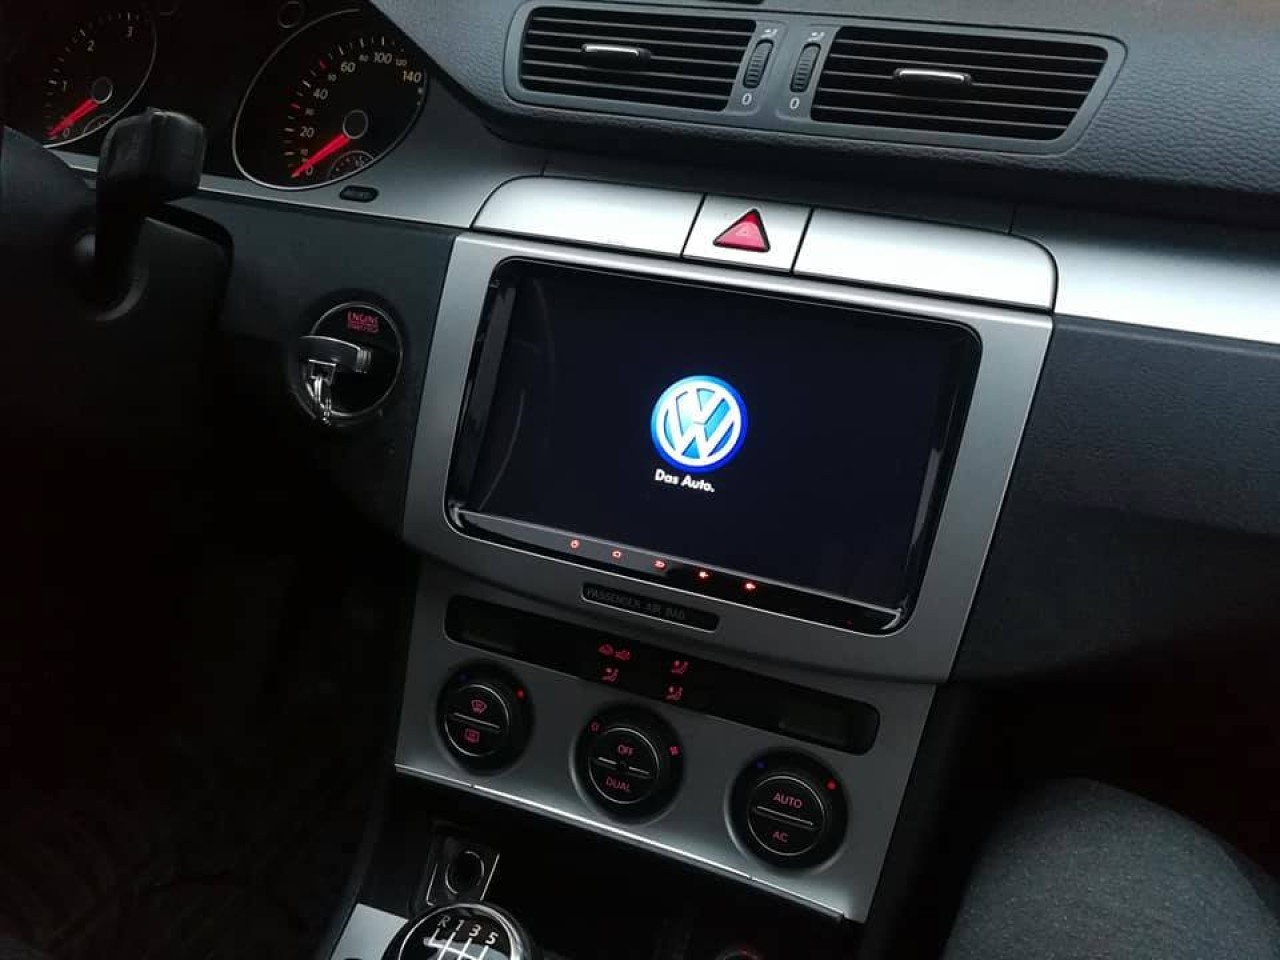 NAVIGATIE CARPAD ANDROID DEDICATA Seat Altea NAVD-MT9800 9'' 16GB 2GB RAM GPS WAZE CAMERA BONUS!